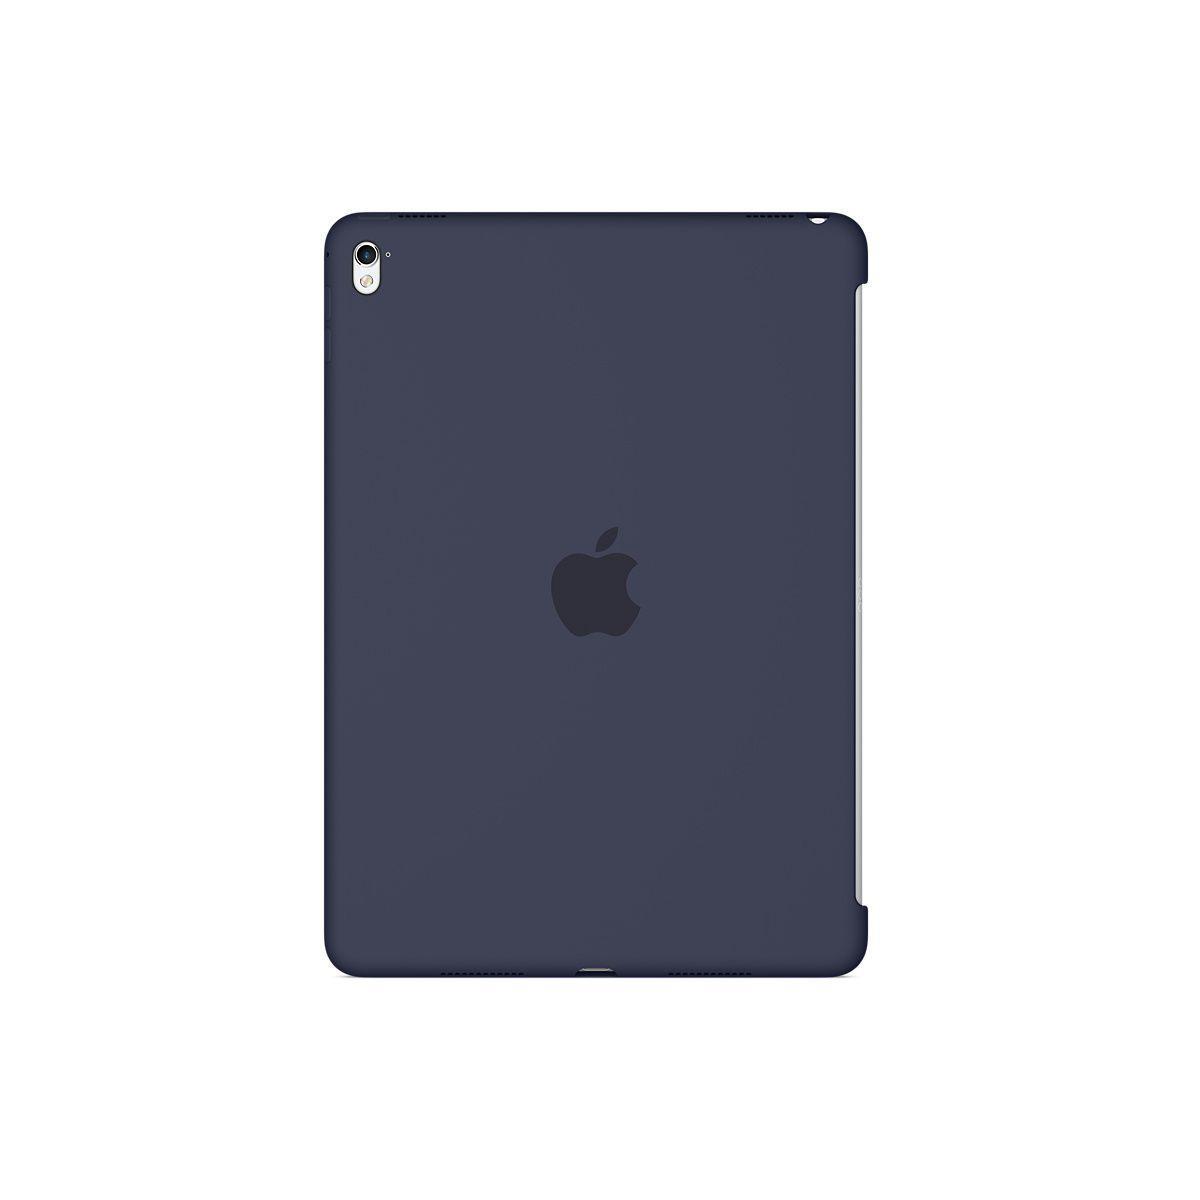 Coque apple silicone bleu nuit ipad pro 9.7'' - livraison offerte : code premium (photo)